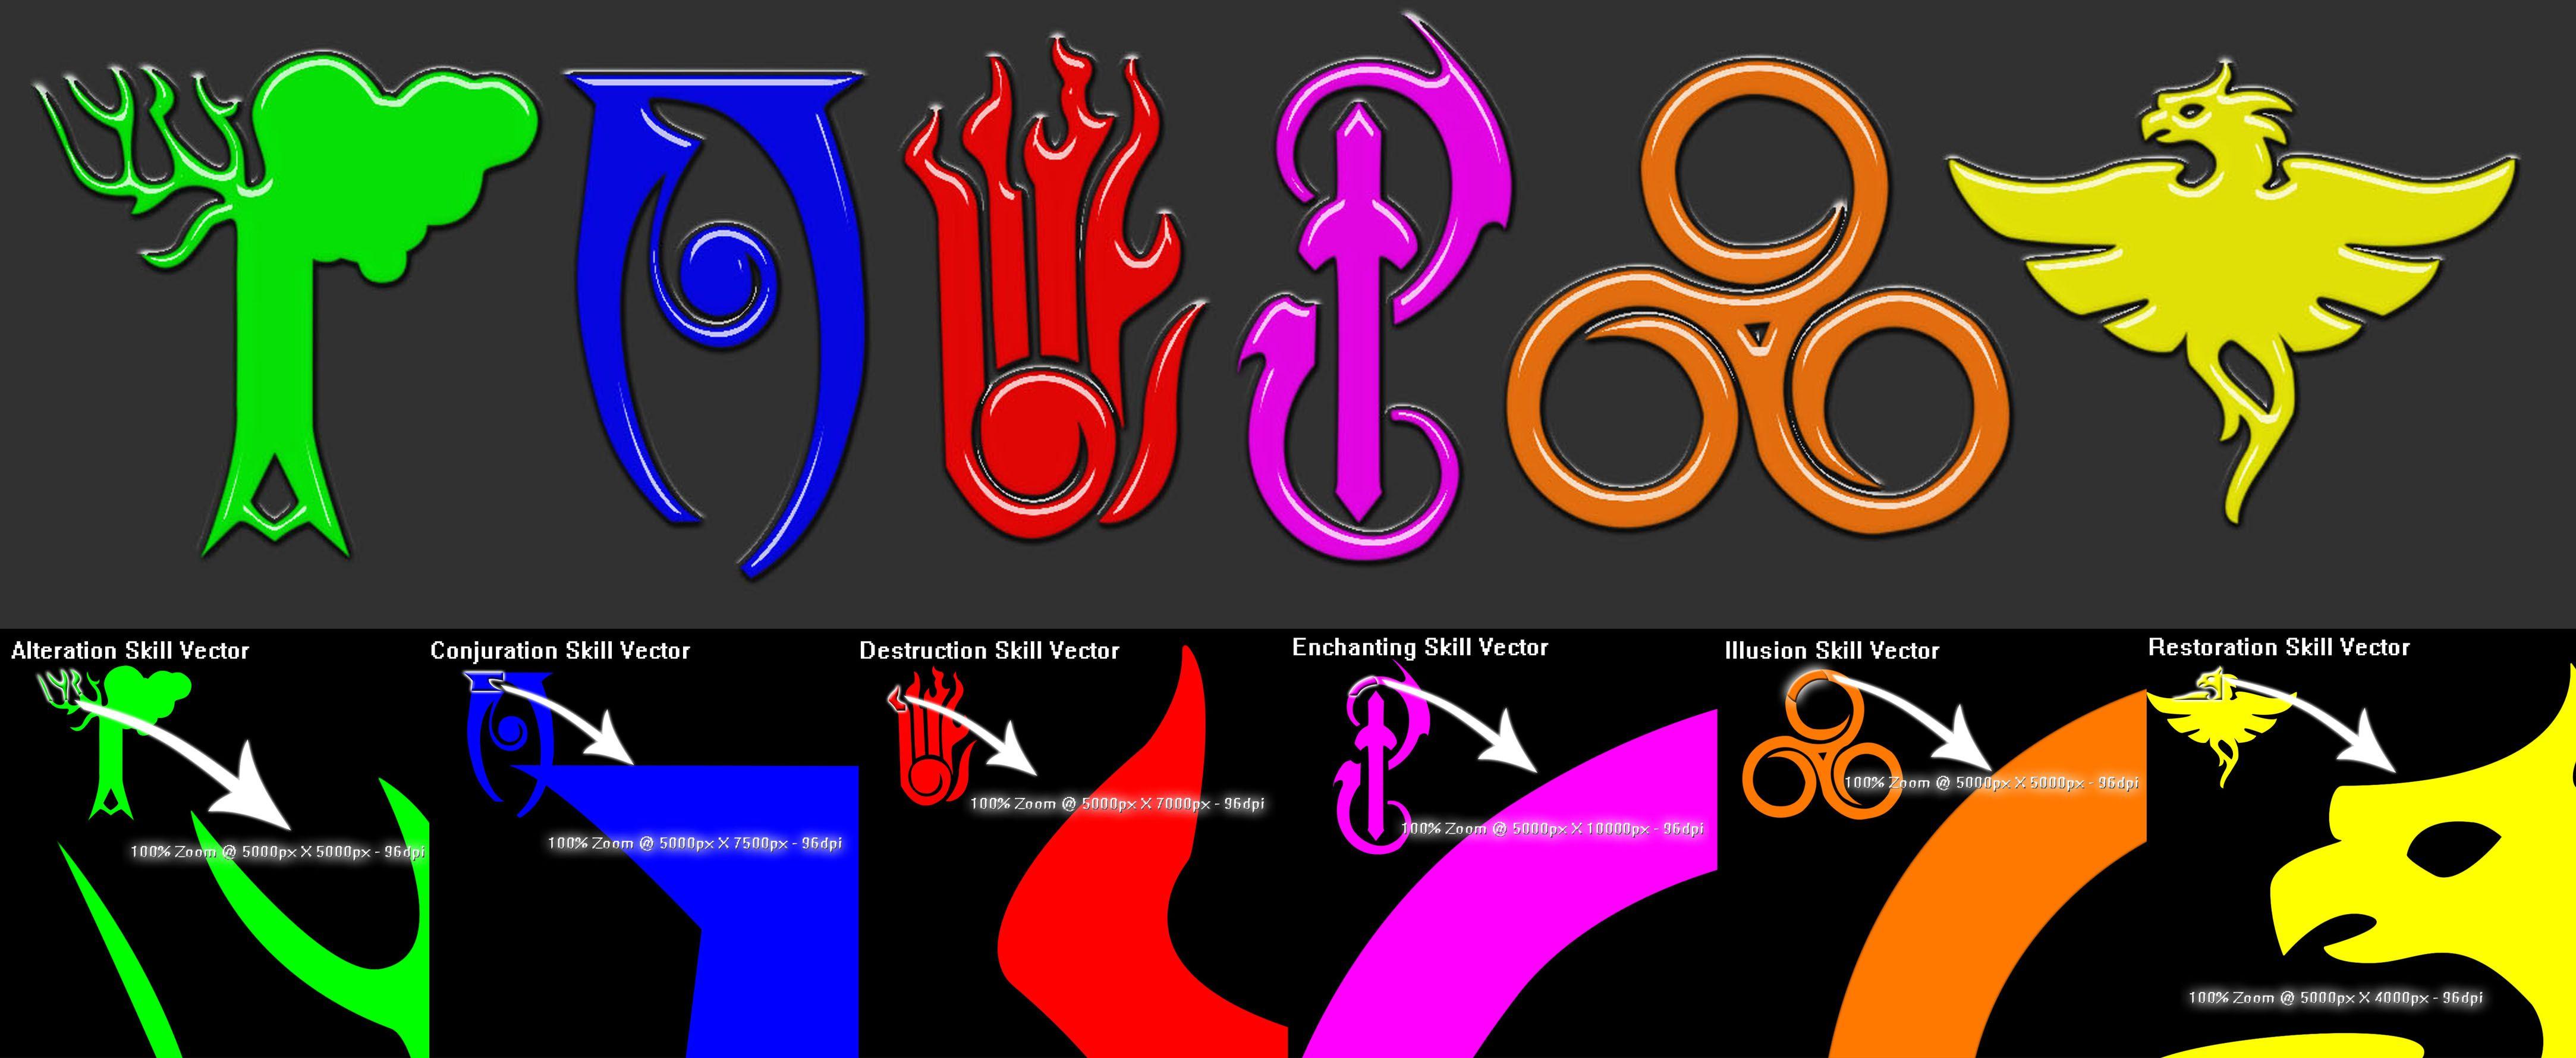 Skyrim 6 schools of magic symbol vectors by jeclxohkoiantart skyrim 6 schools of magic symbol vectors by jeclxohkoiantart on buycottarizona Image collections